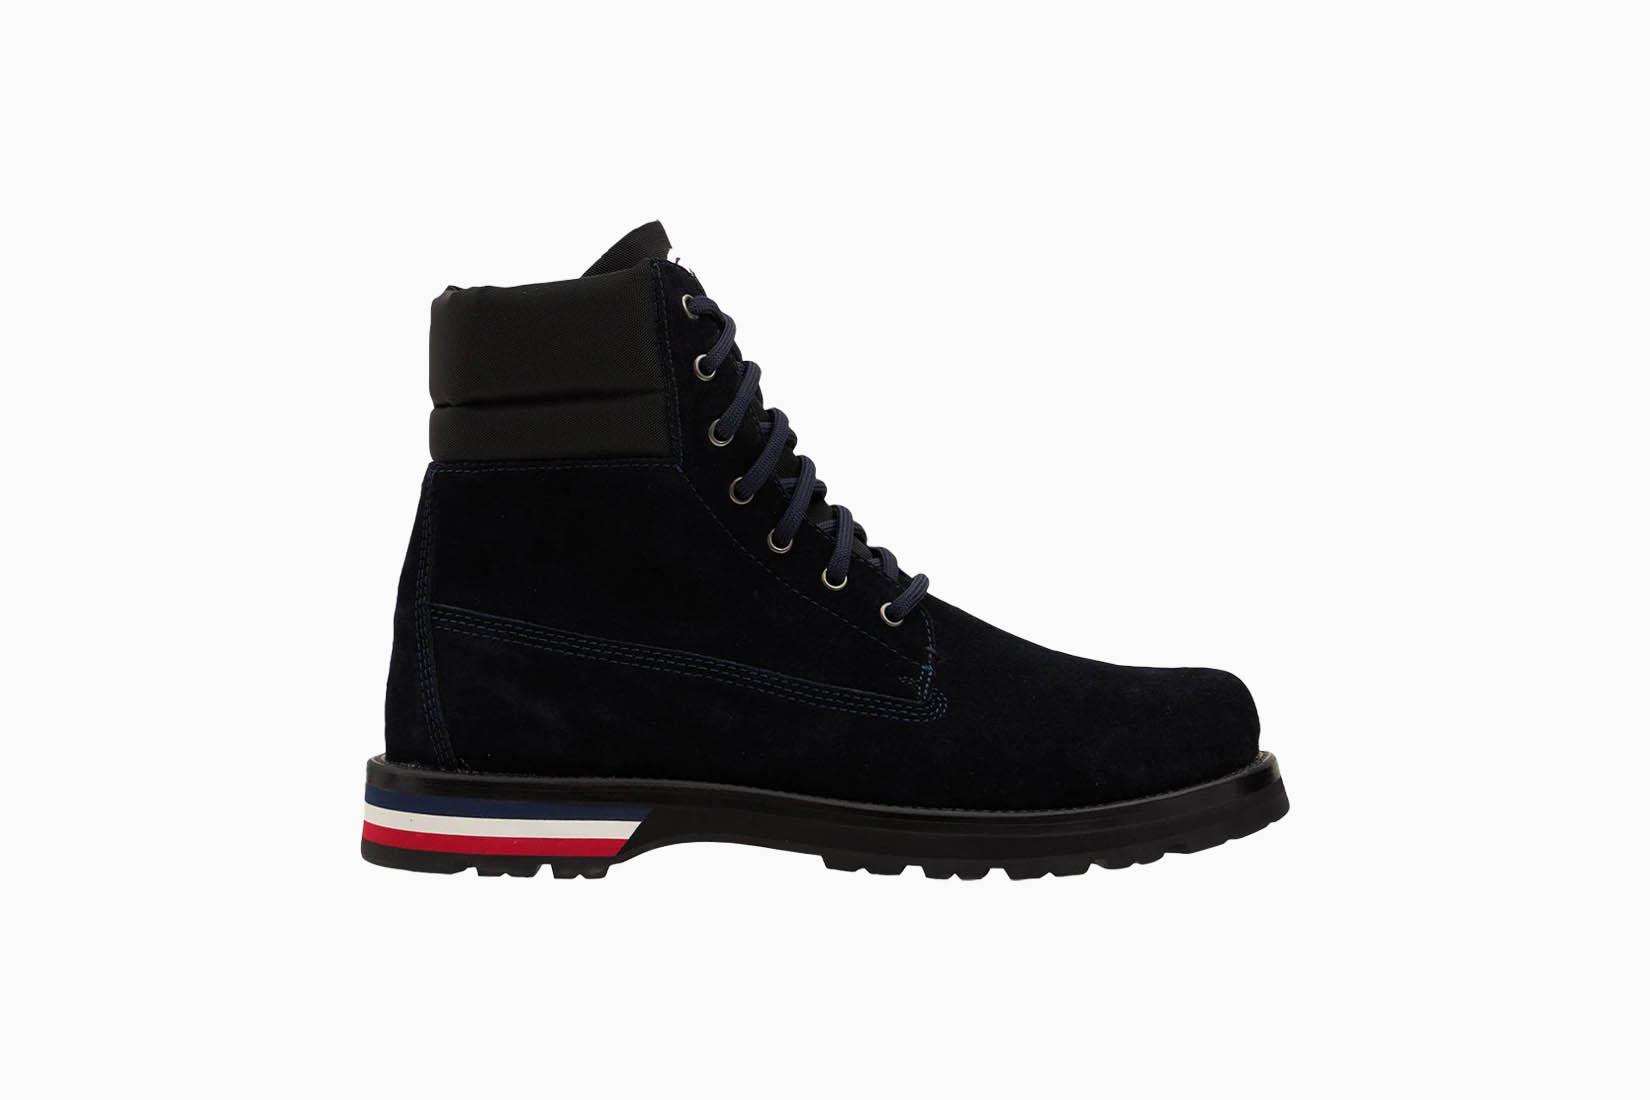 best casual shoes men moncler boots review Luxe Digital